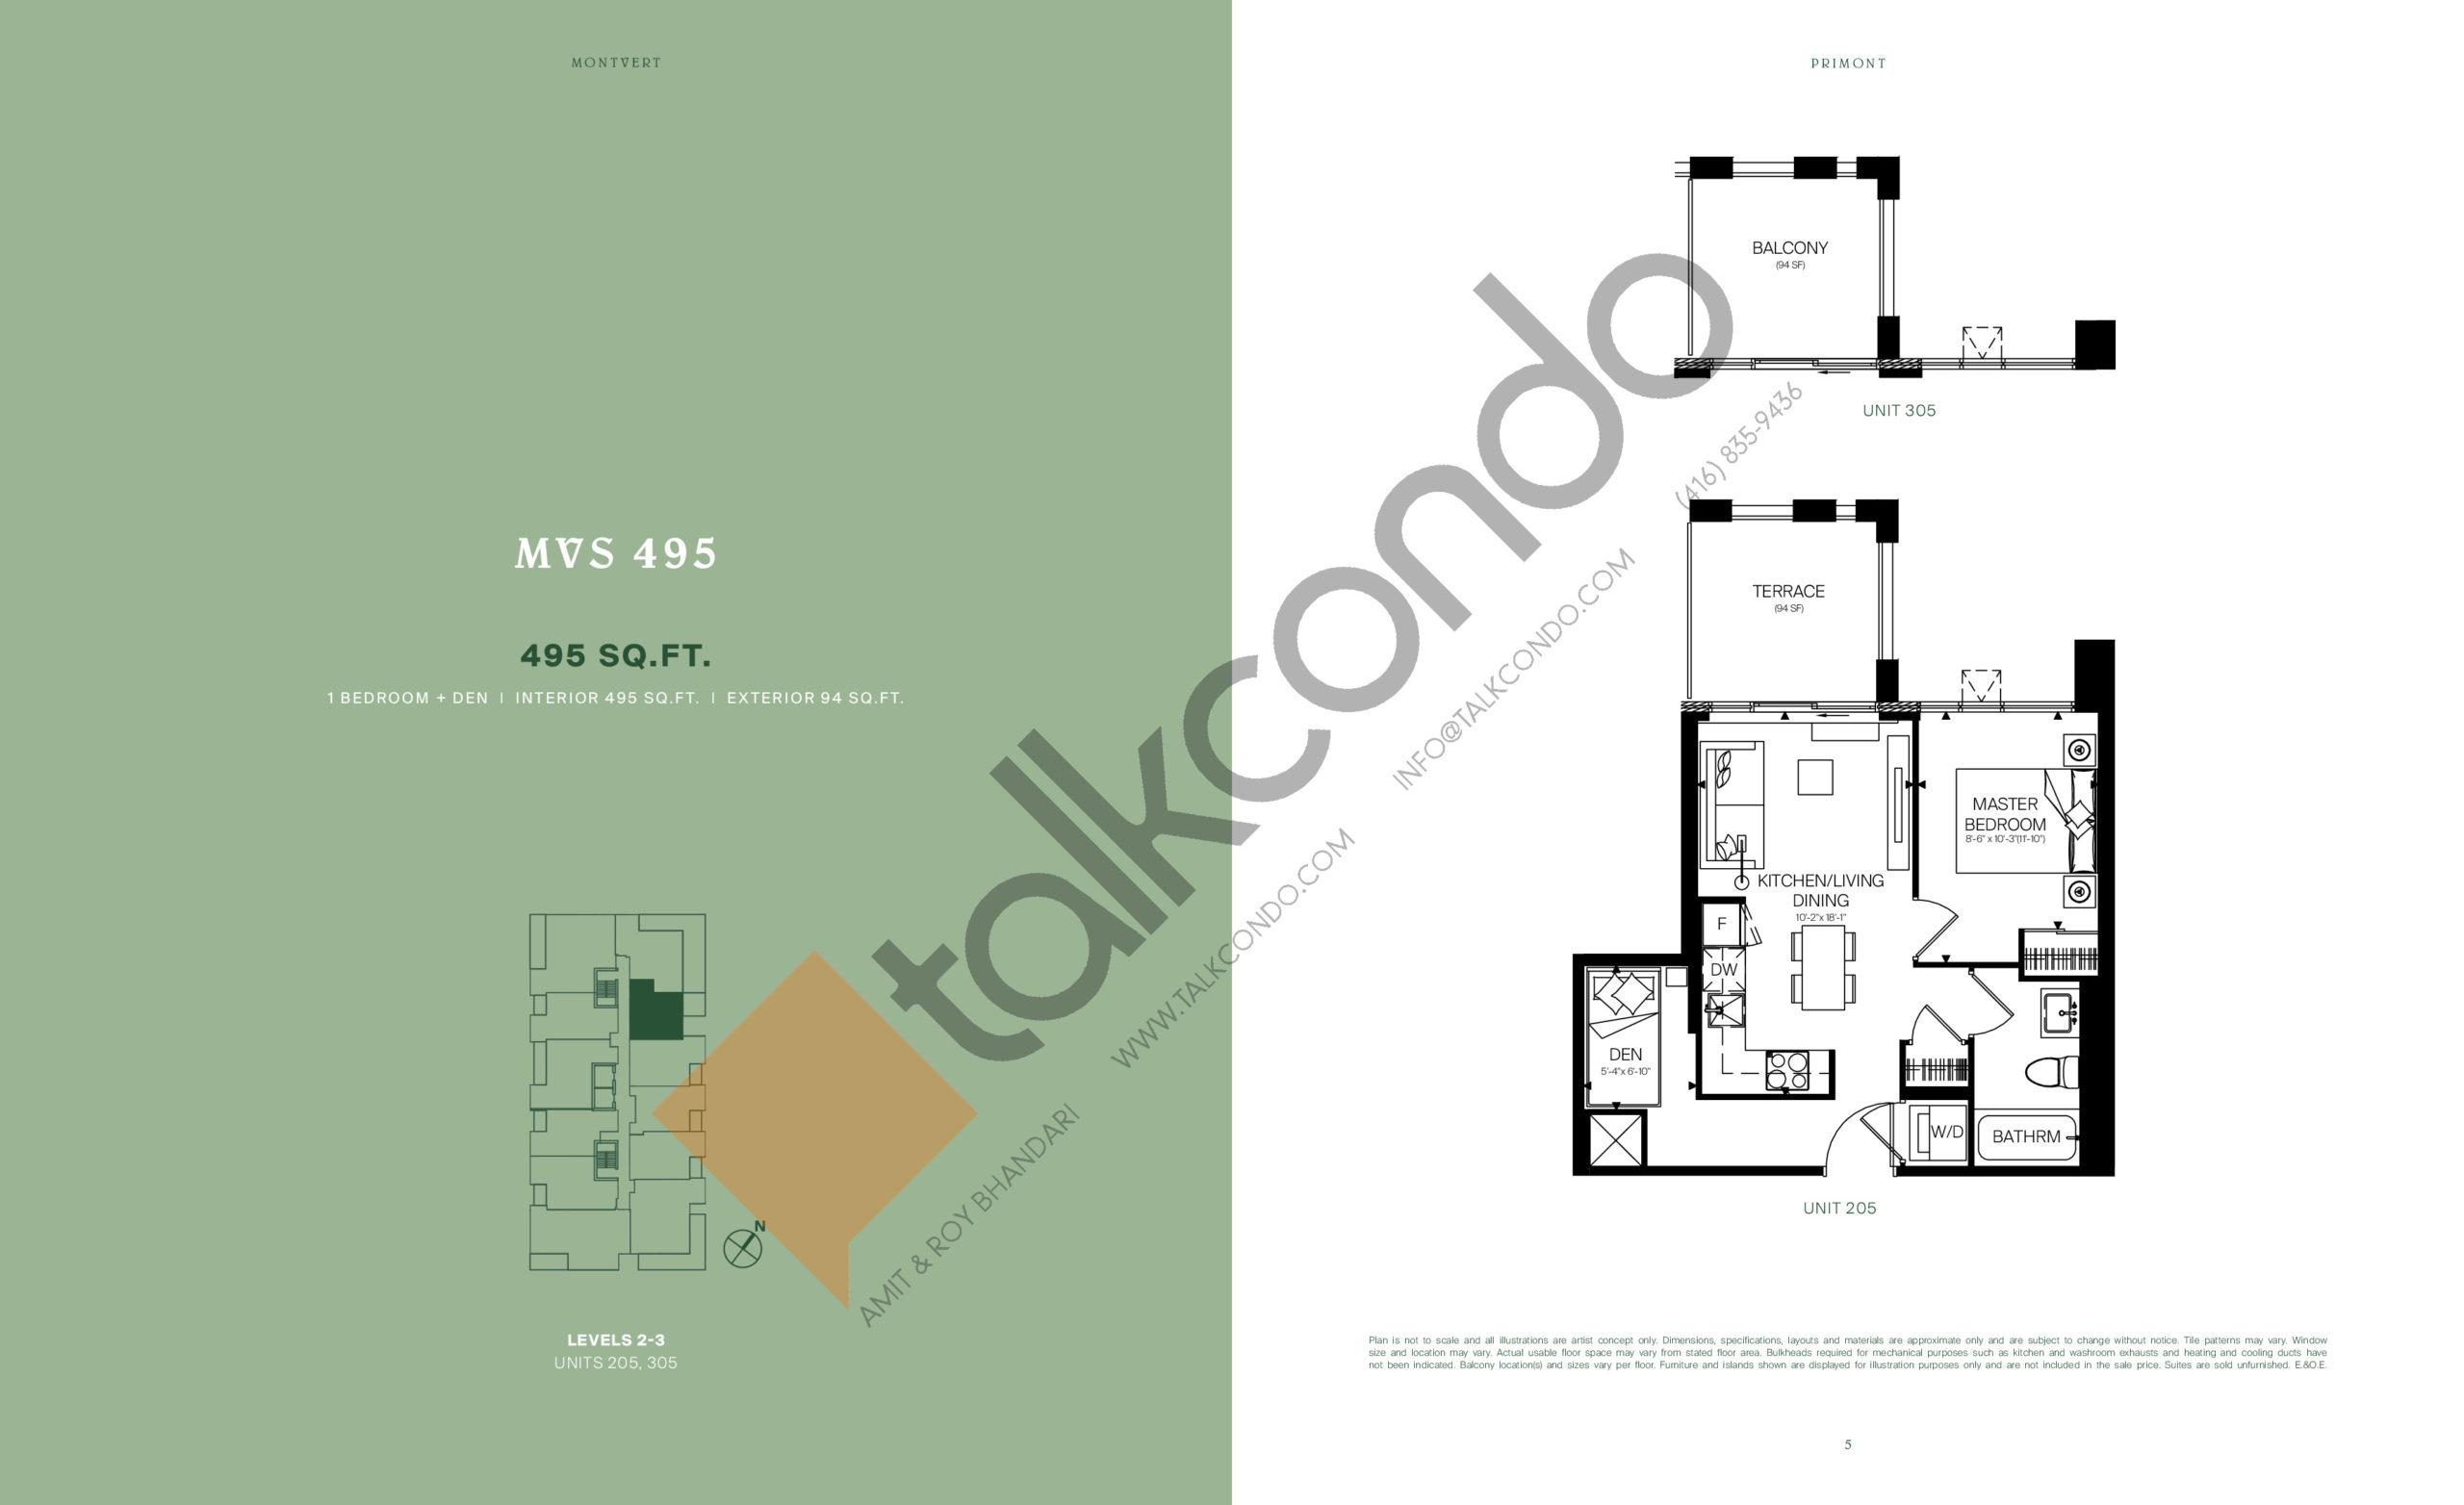 MVS 495 Floor Plan at MontVert Condos - 495 sq.ft